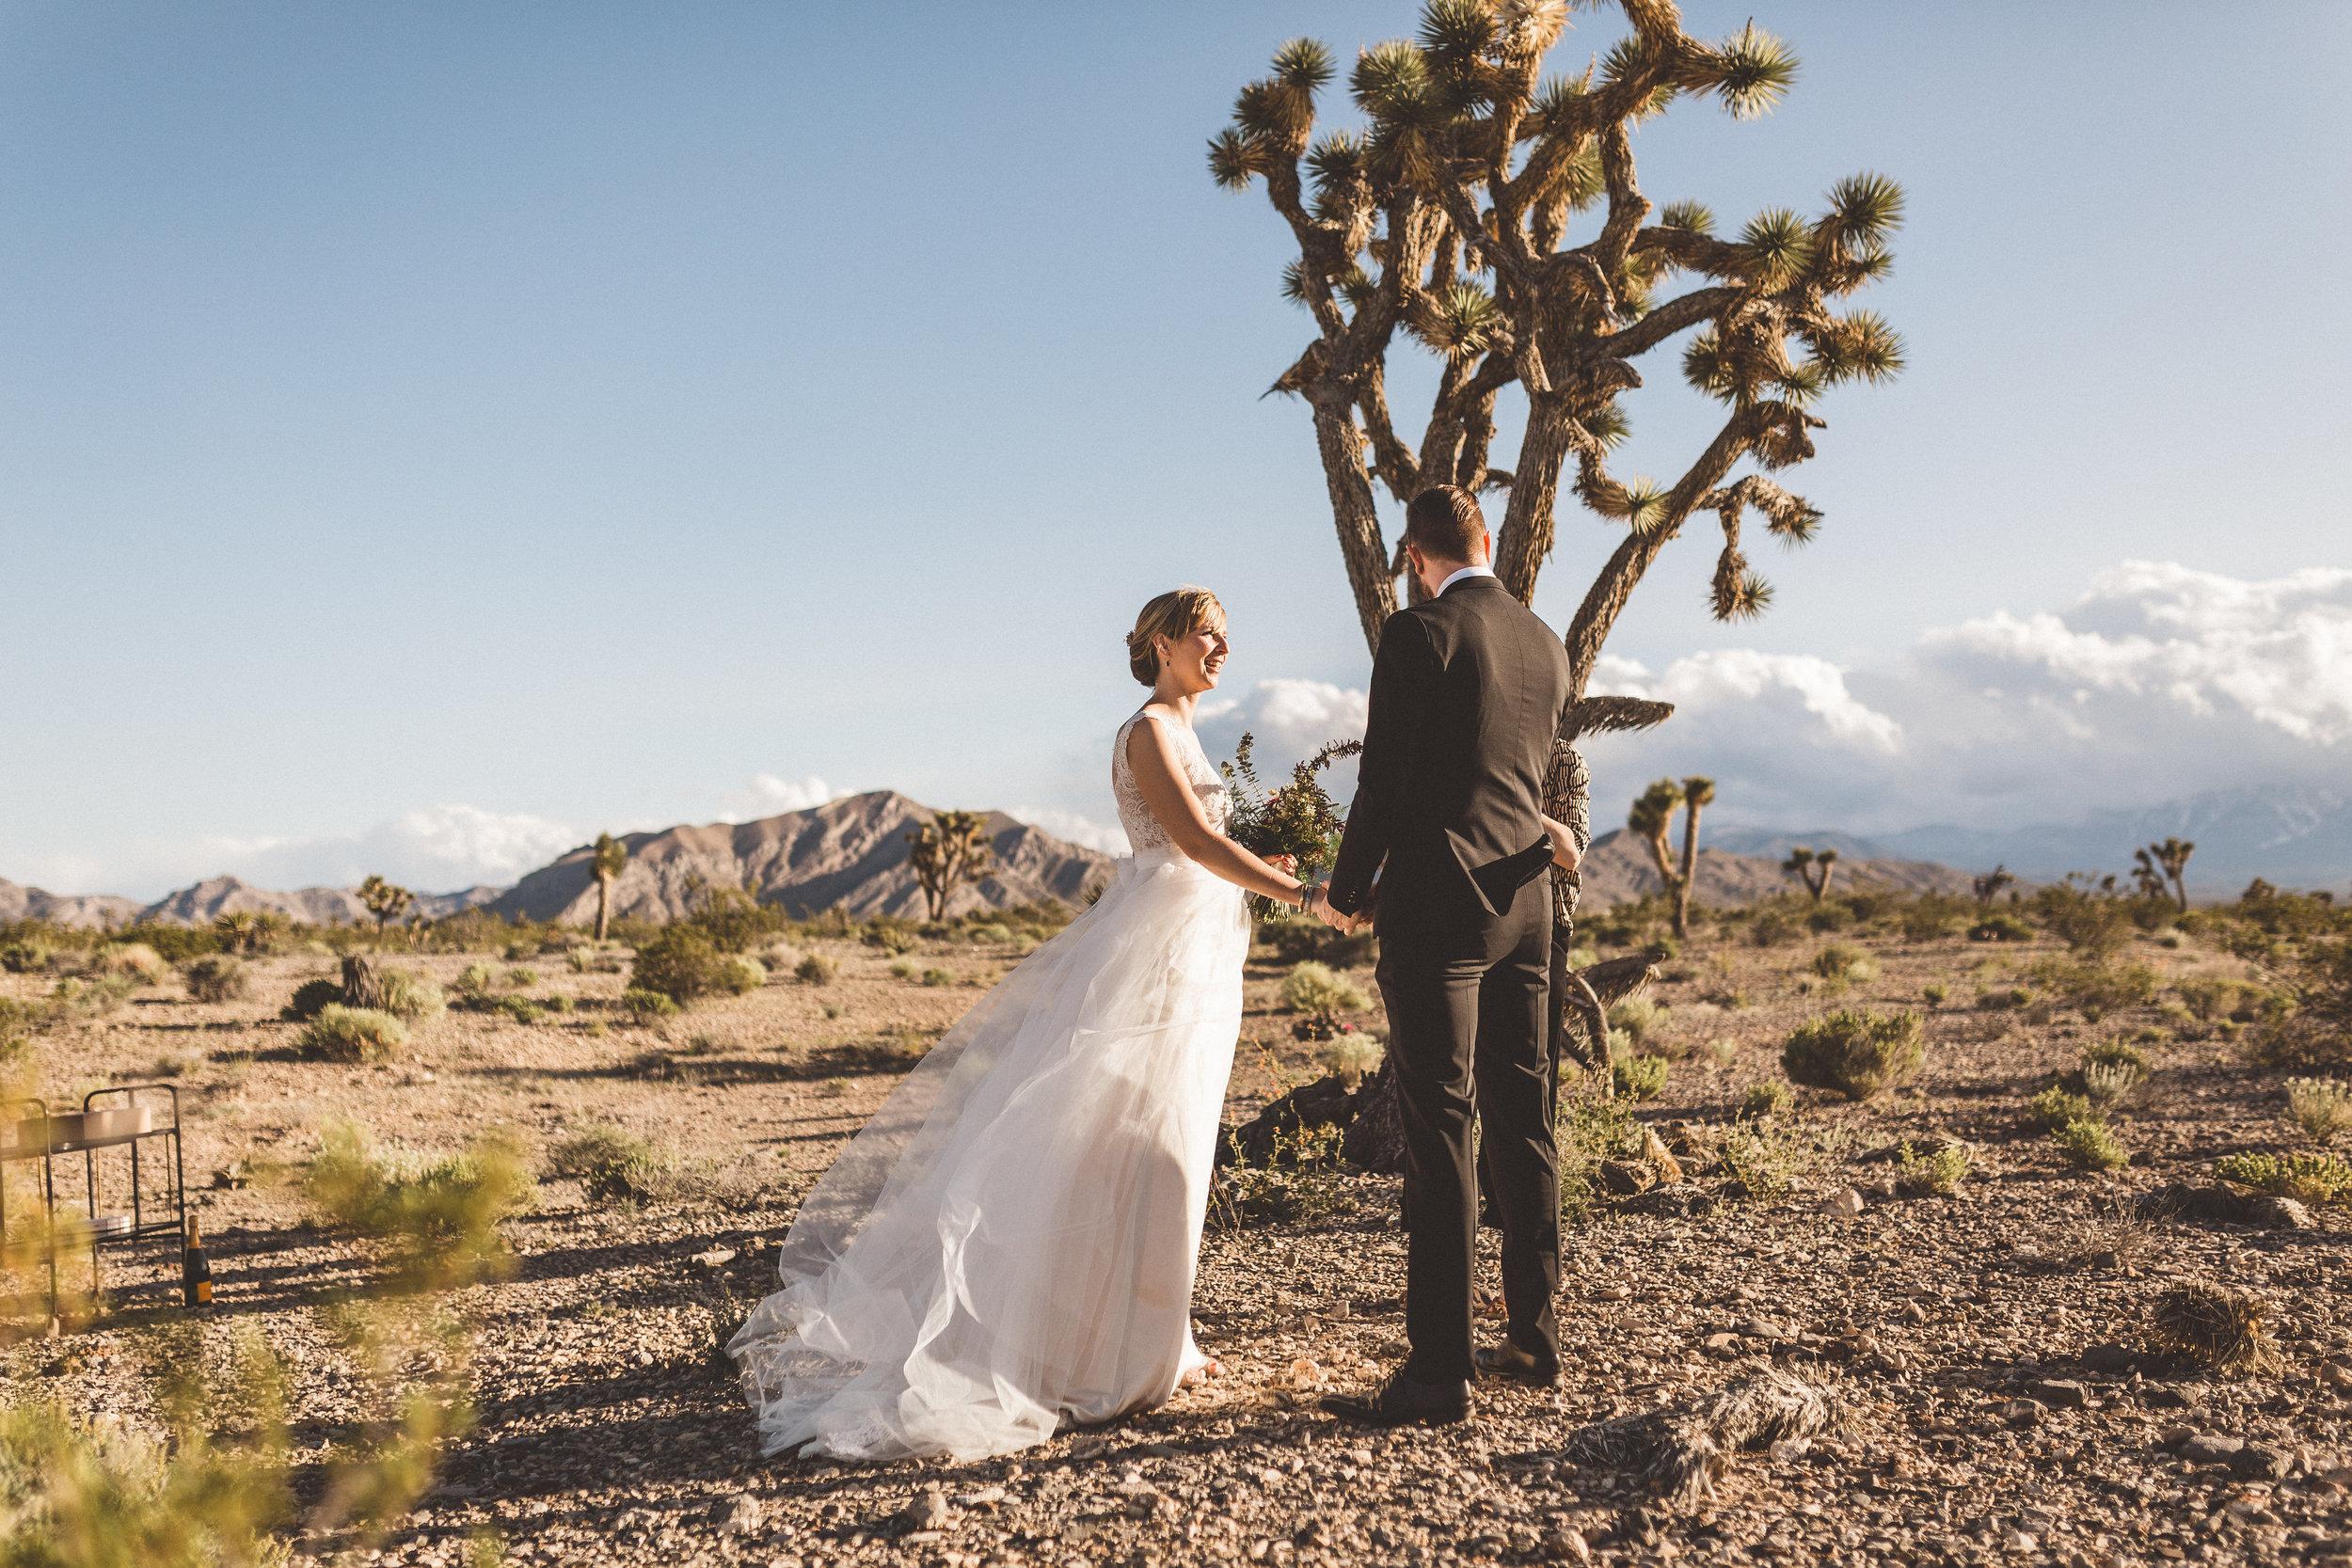 meike-and-rene-las-vegas-desert-elopement2.jpg